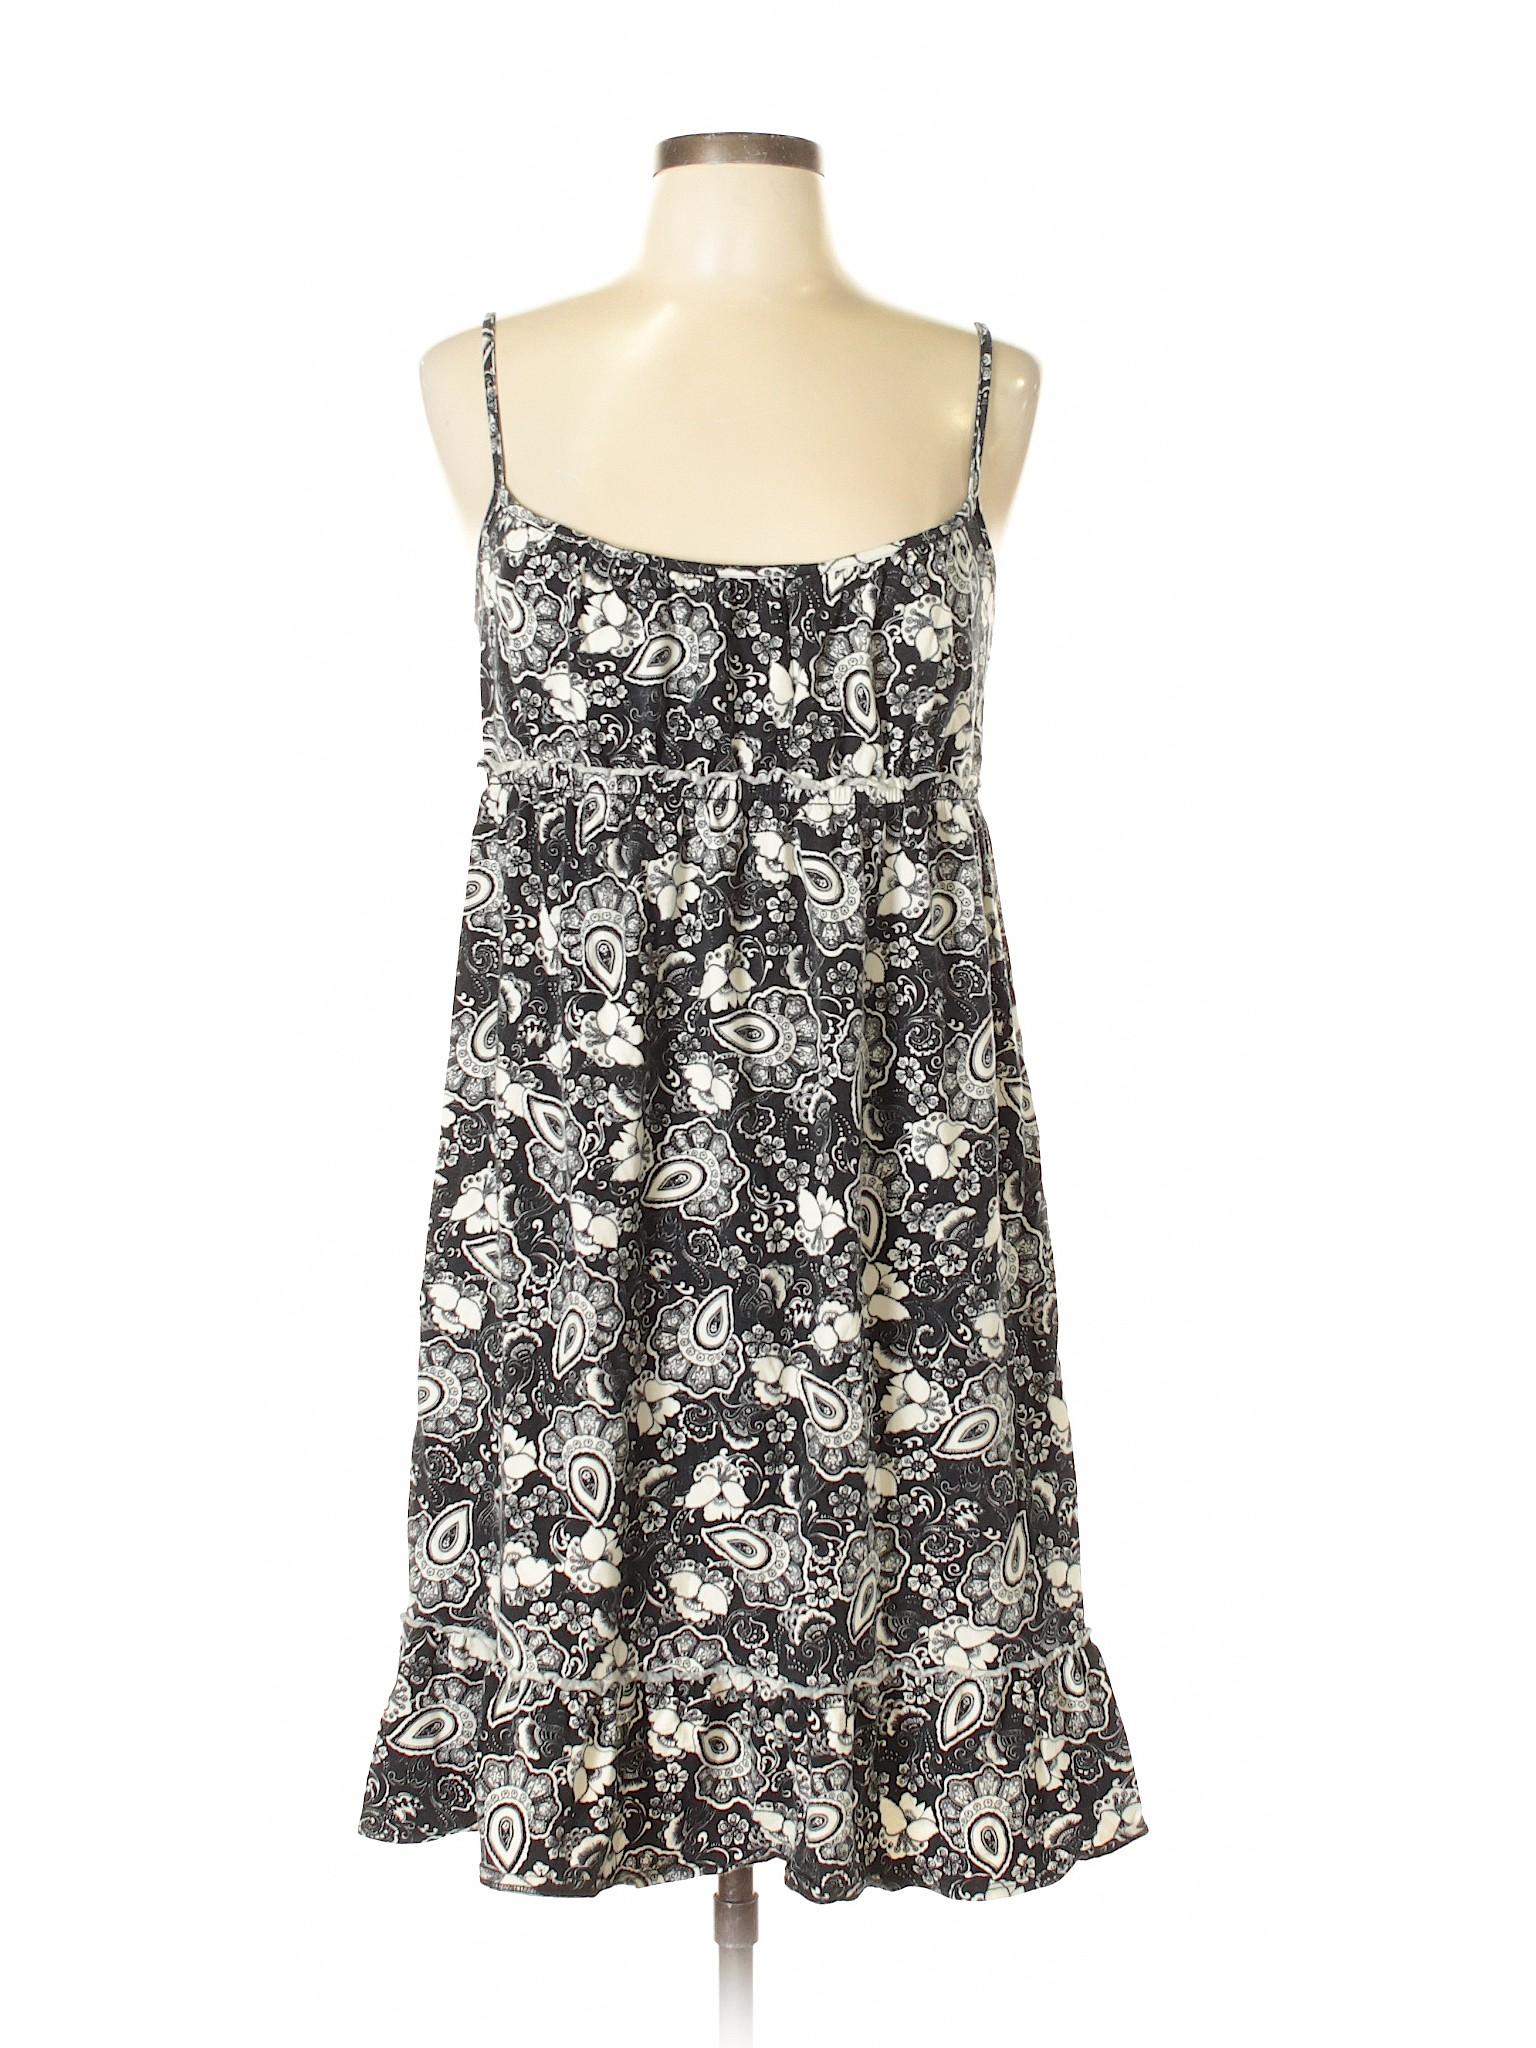 LOFT Ann Dress Casual Boutique Taylor winter qgt656